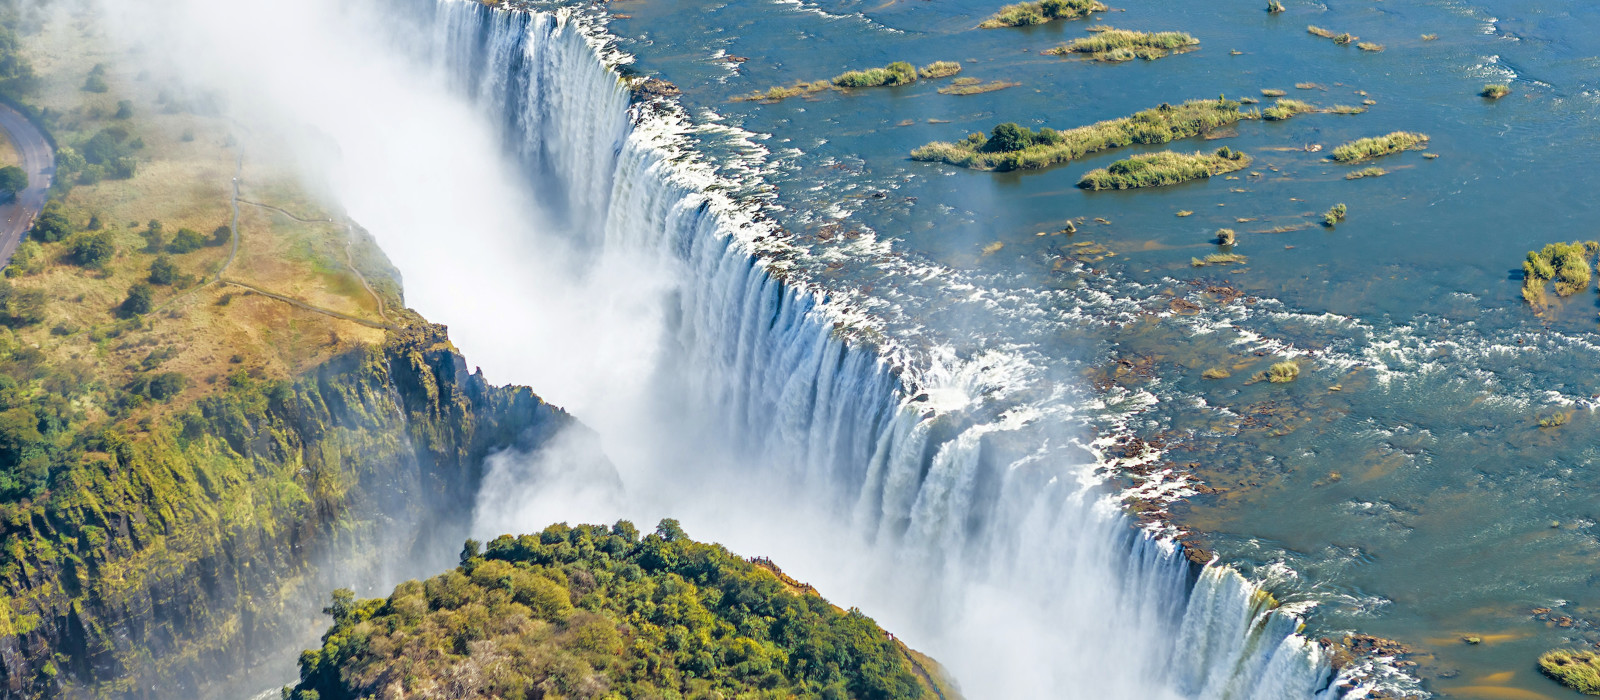 Road Trip: From Victoria Falls to Okavango Tour Trip 1